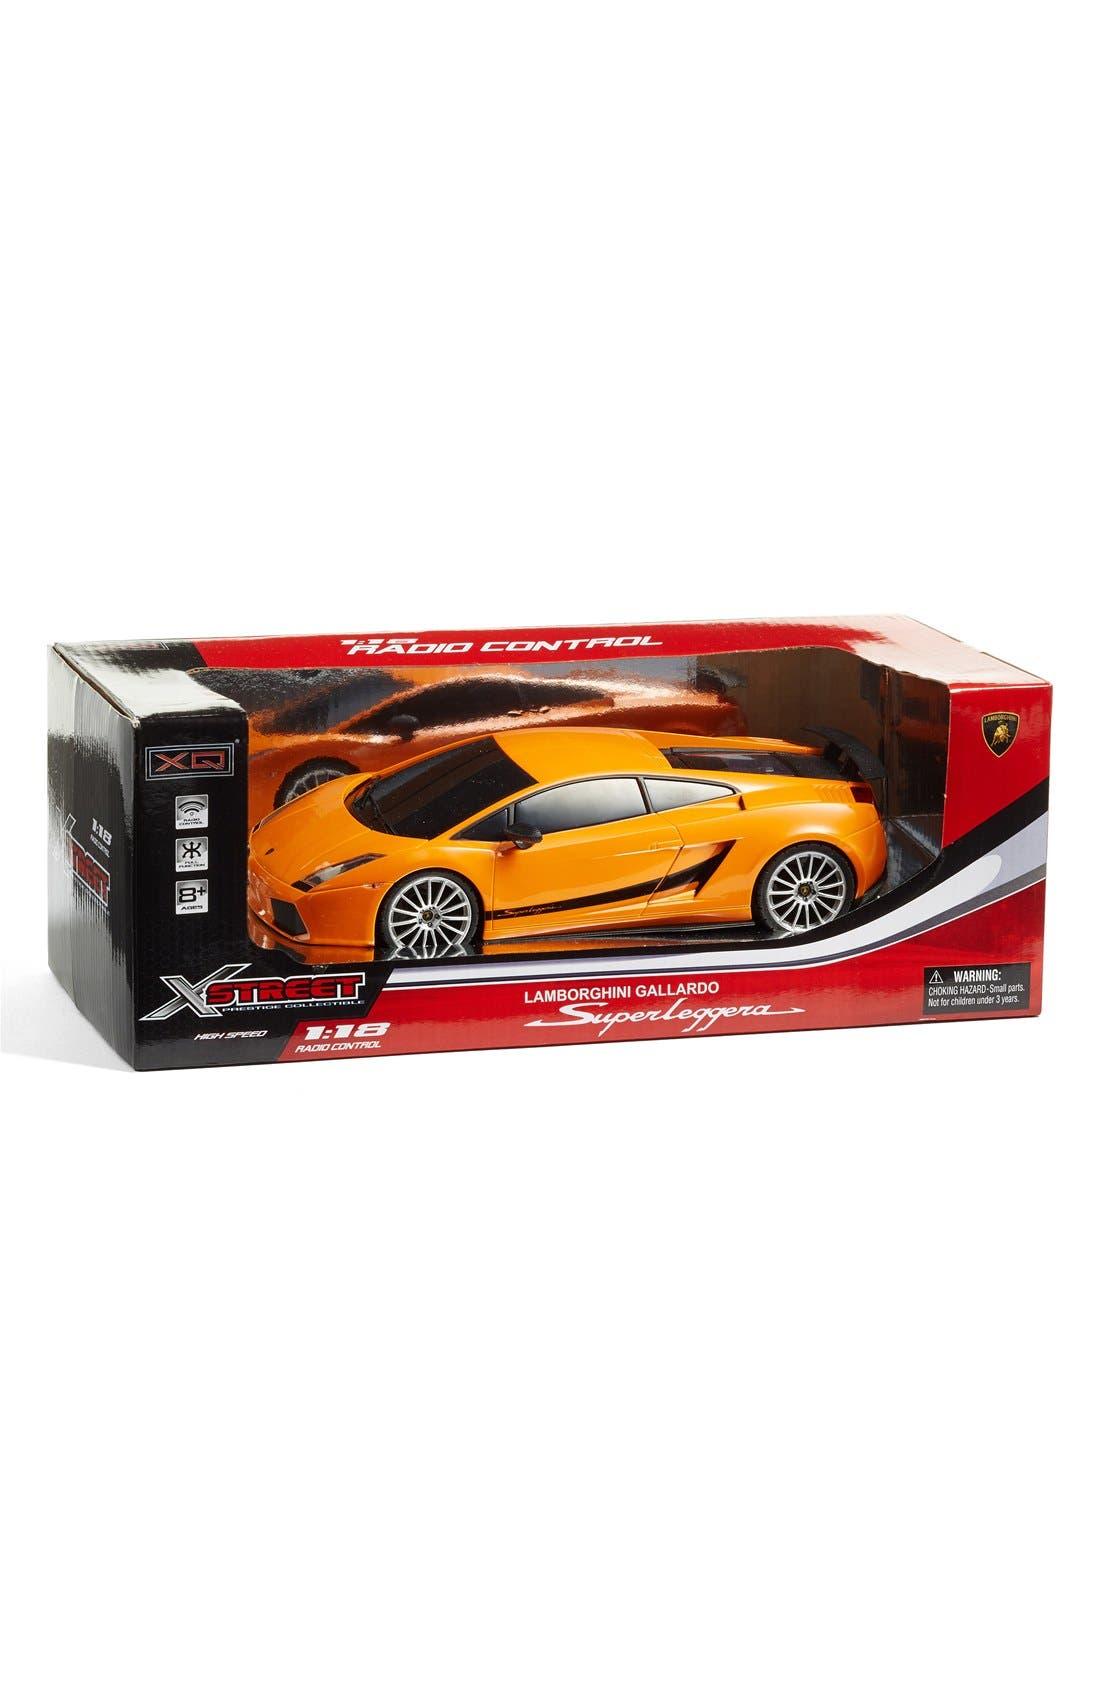 Lamborghini Superleggera 1:18 Scale Remote Control Car Toy,                             Alternate thumbnail 2, color,                             800